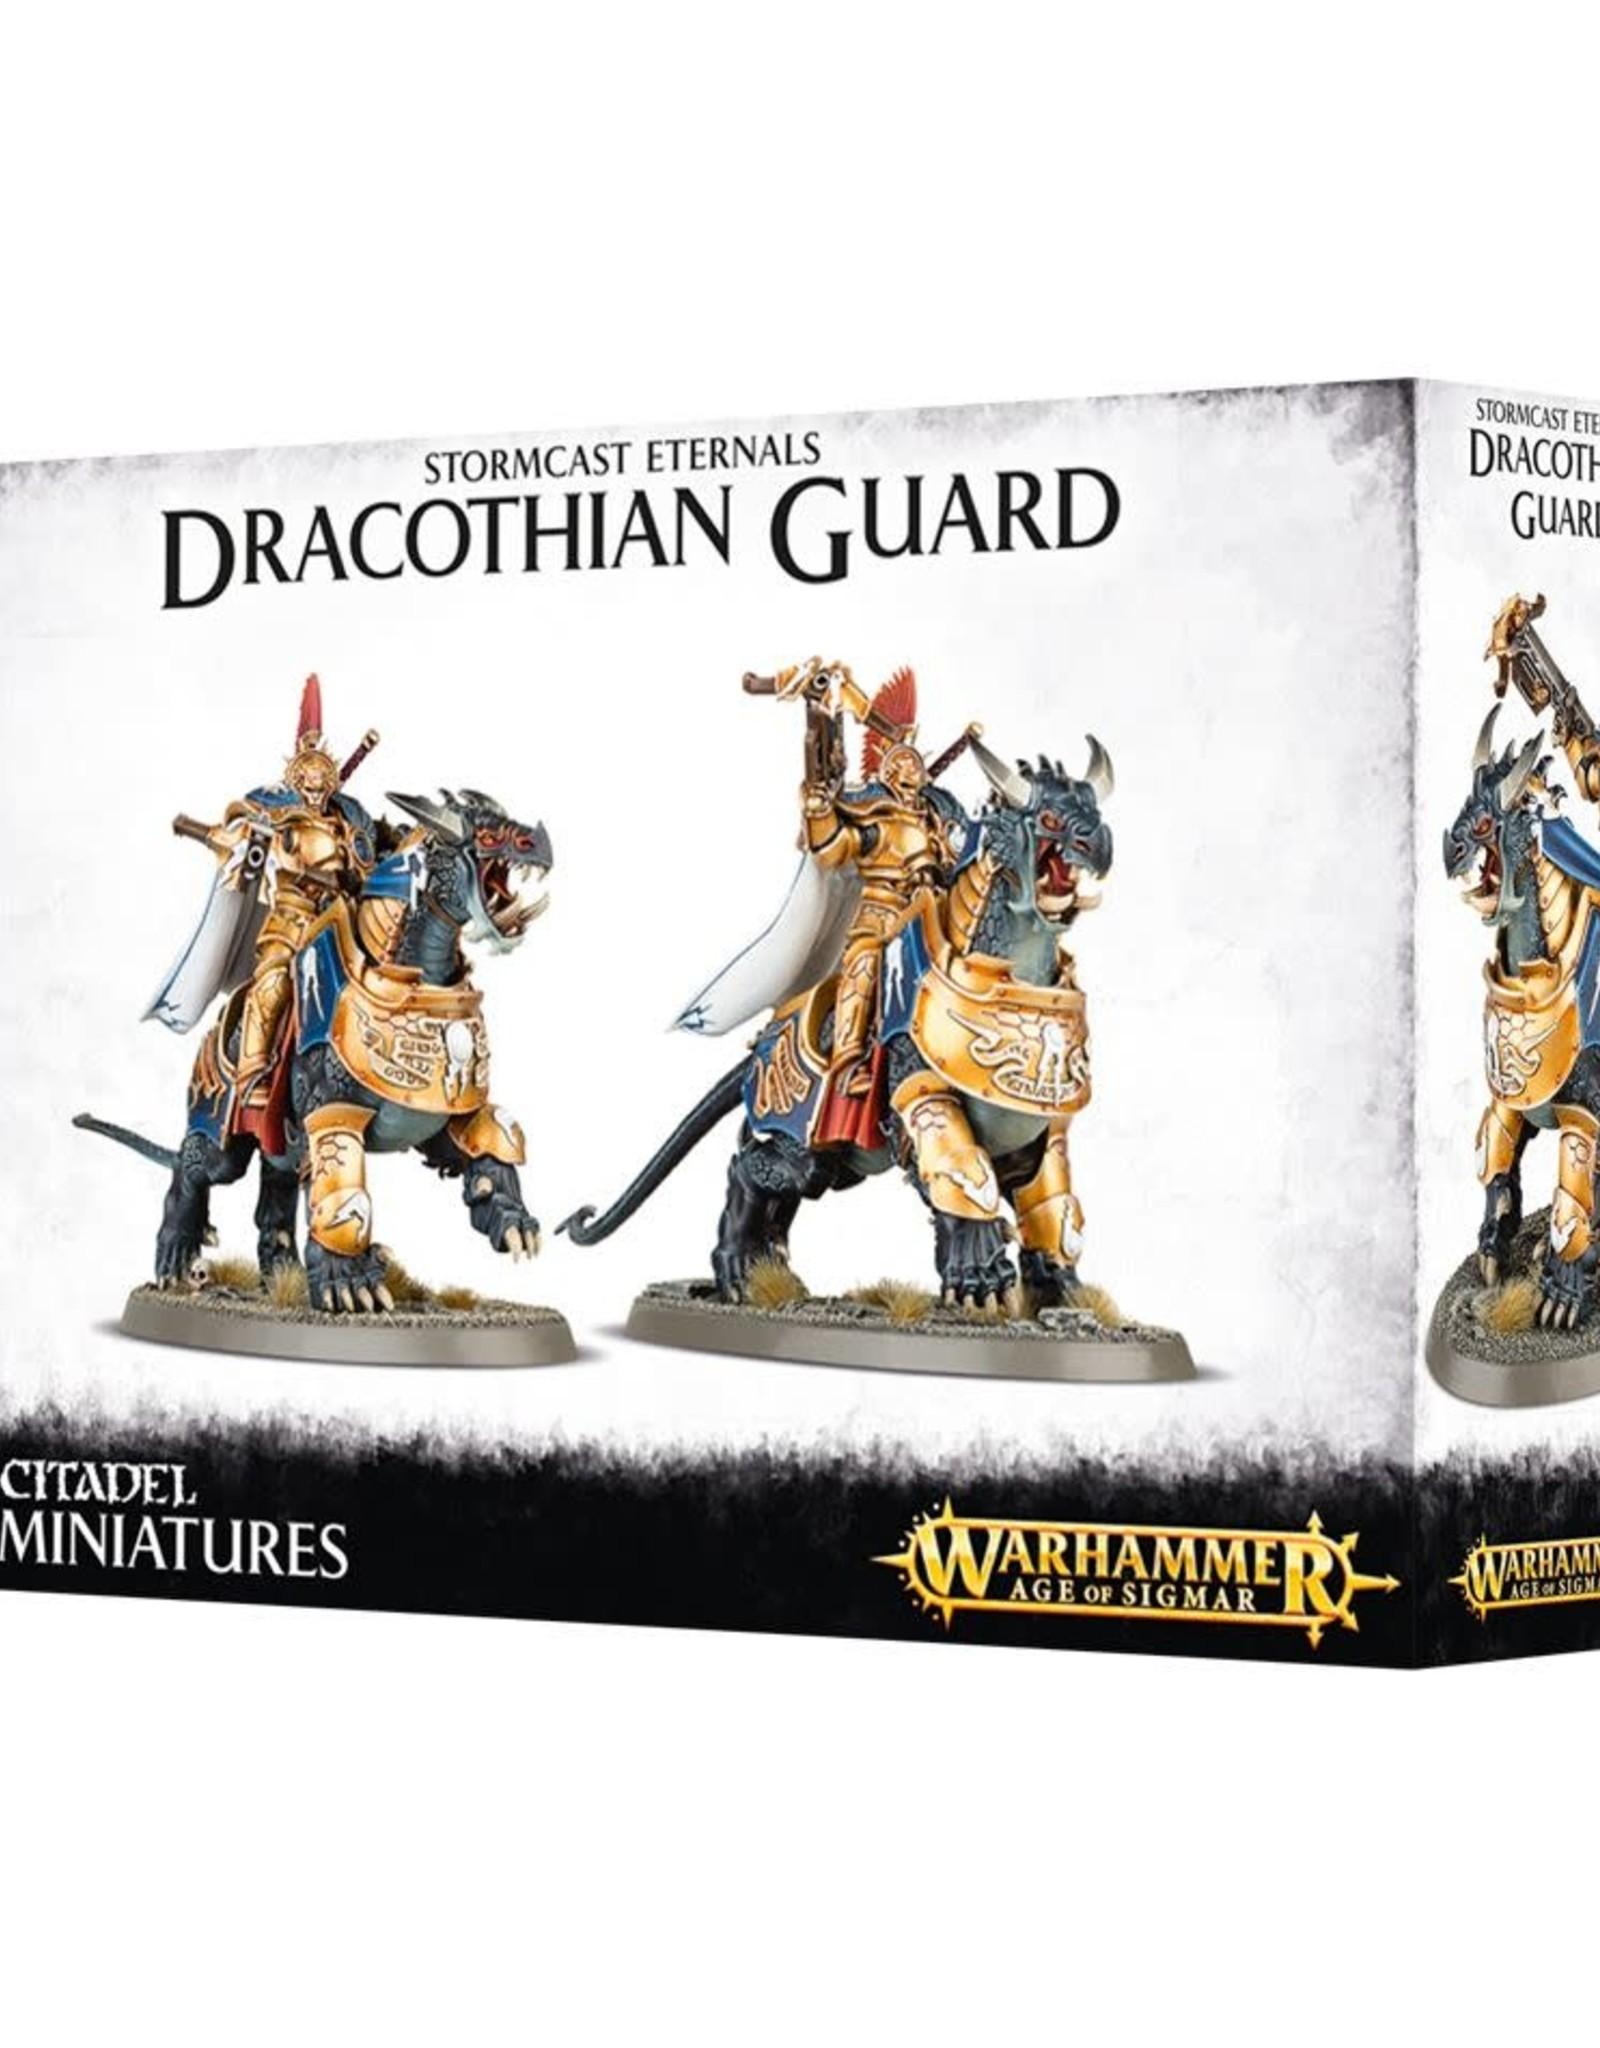 Age of Sigmar Stormcast Eternals Dracothian Guard